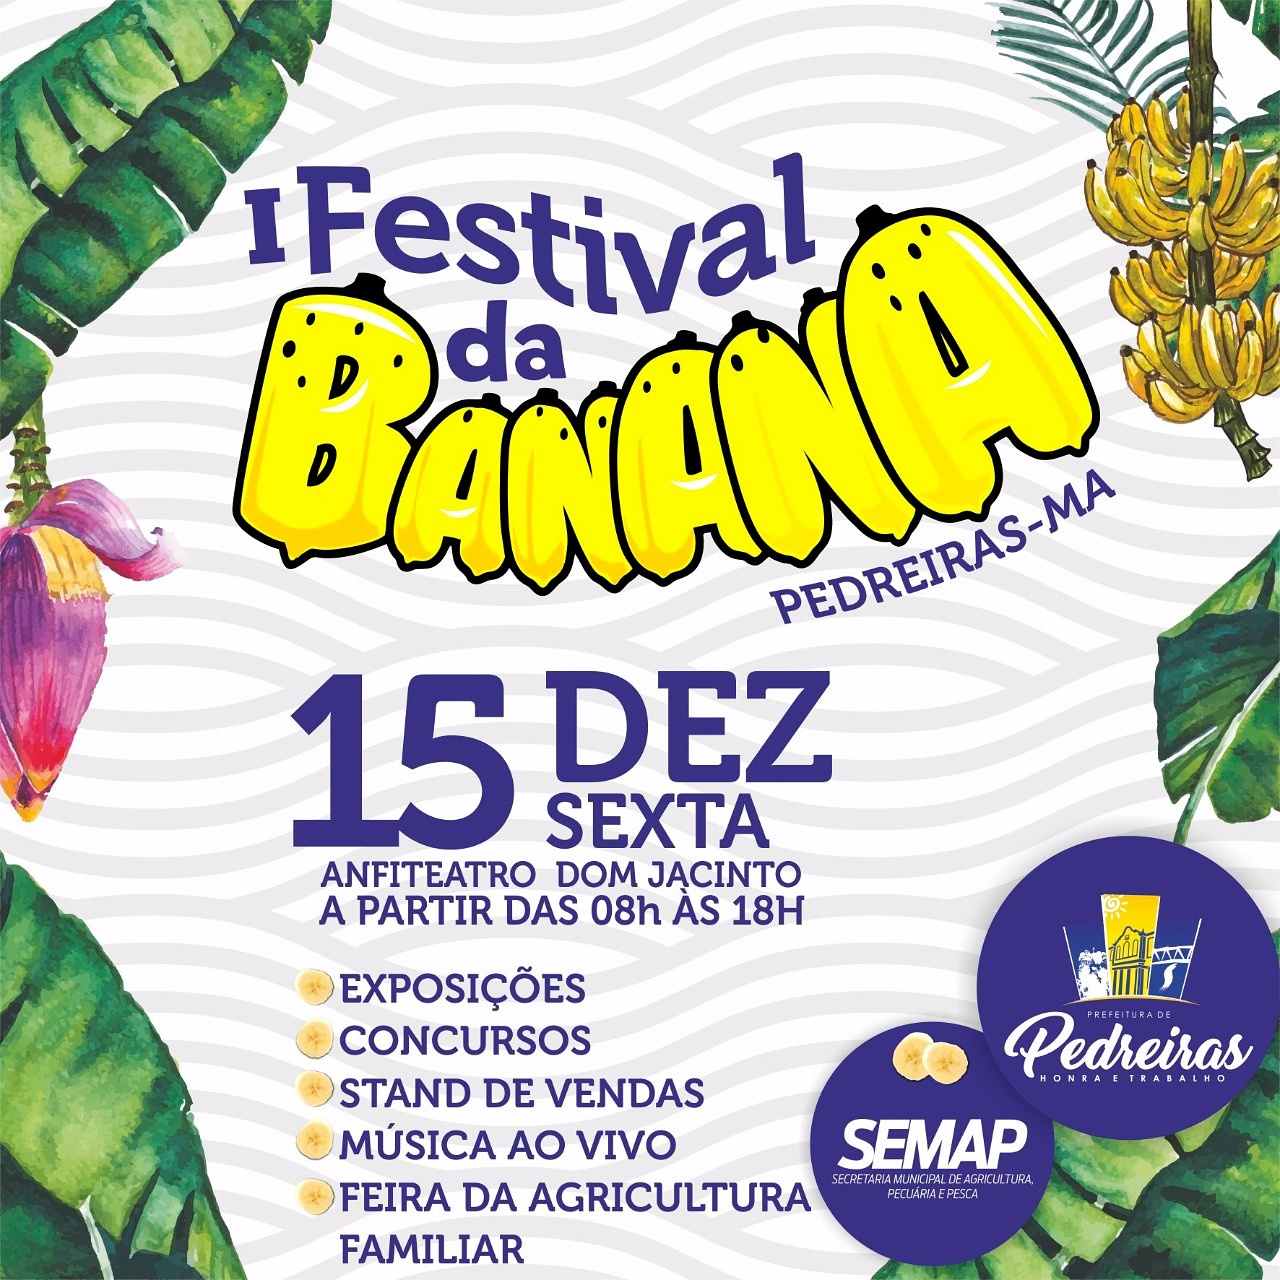 I FESTIVAL DA BANANA